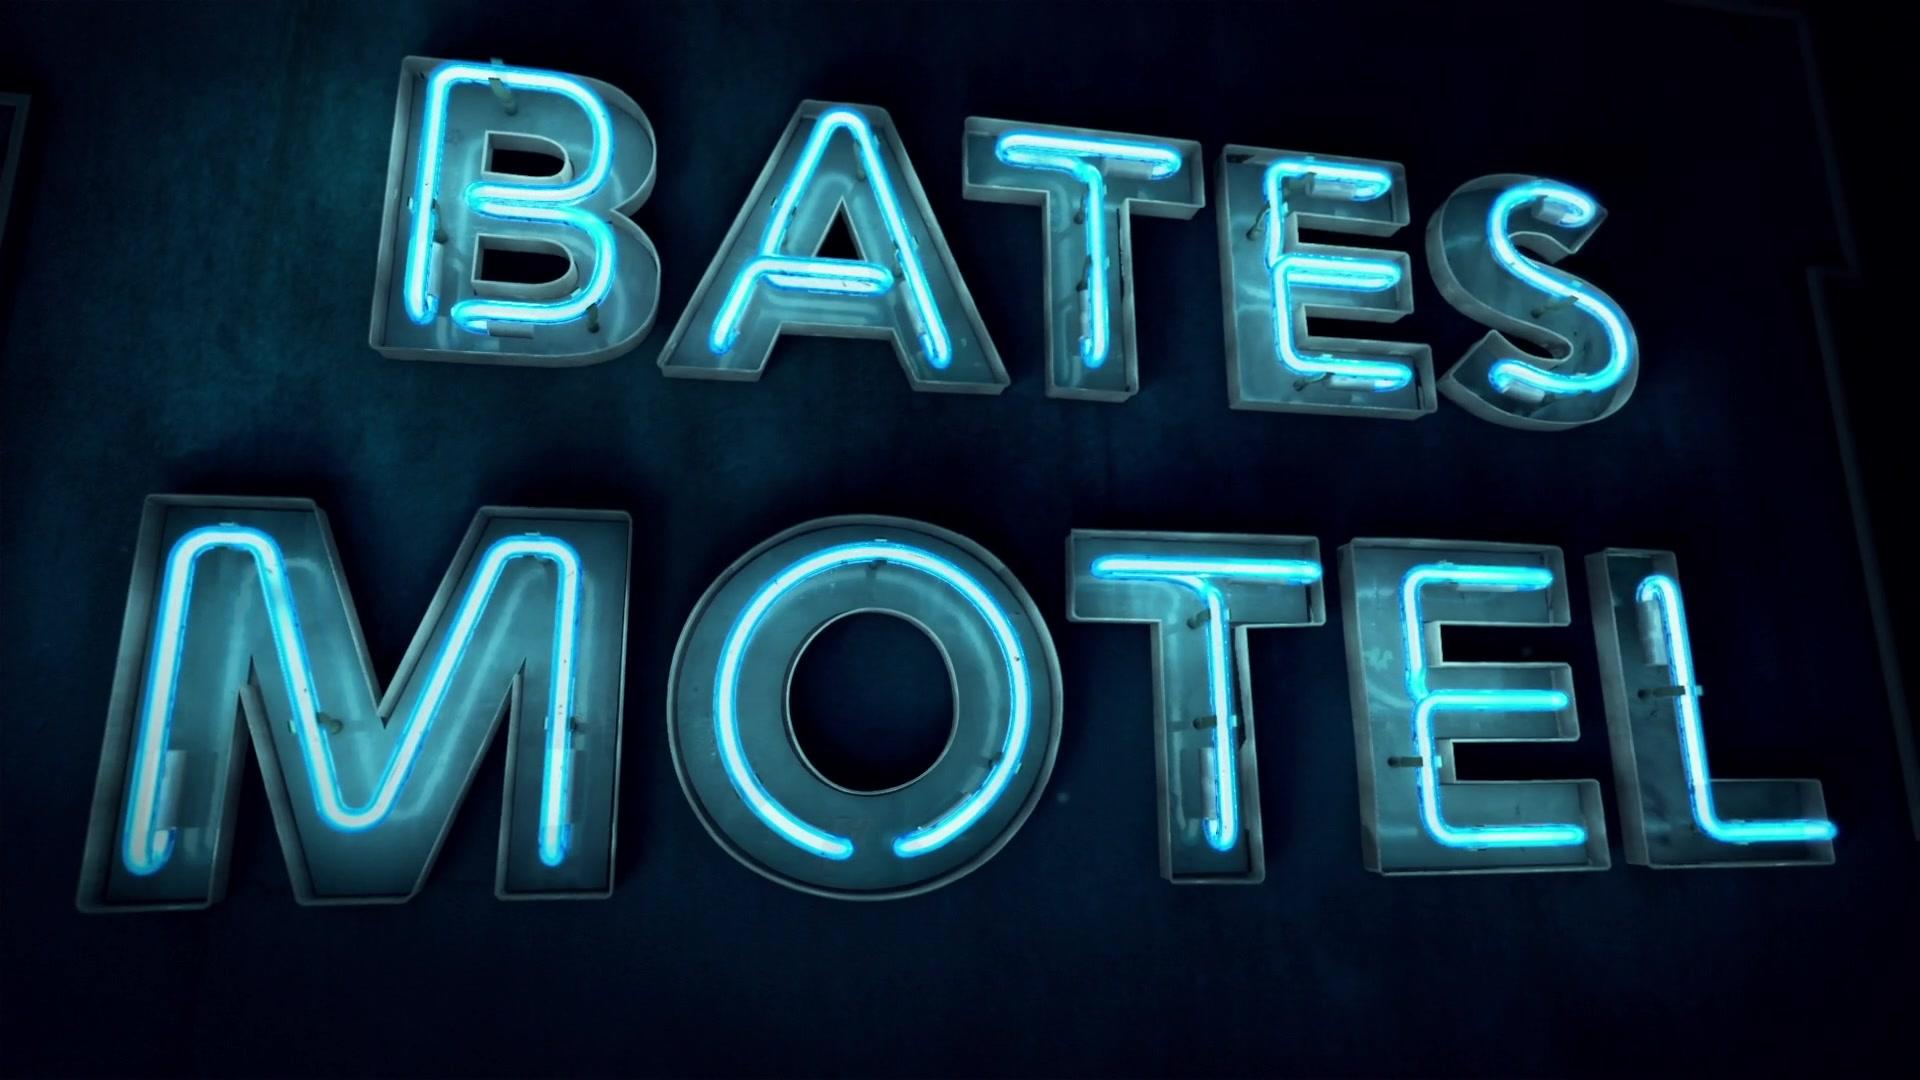 batesmotel-1